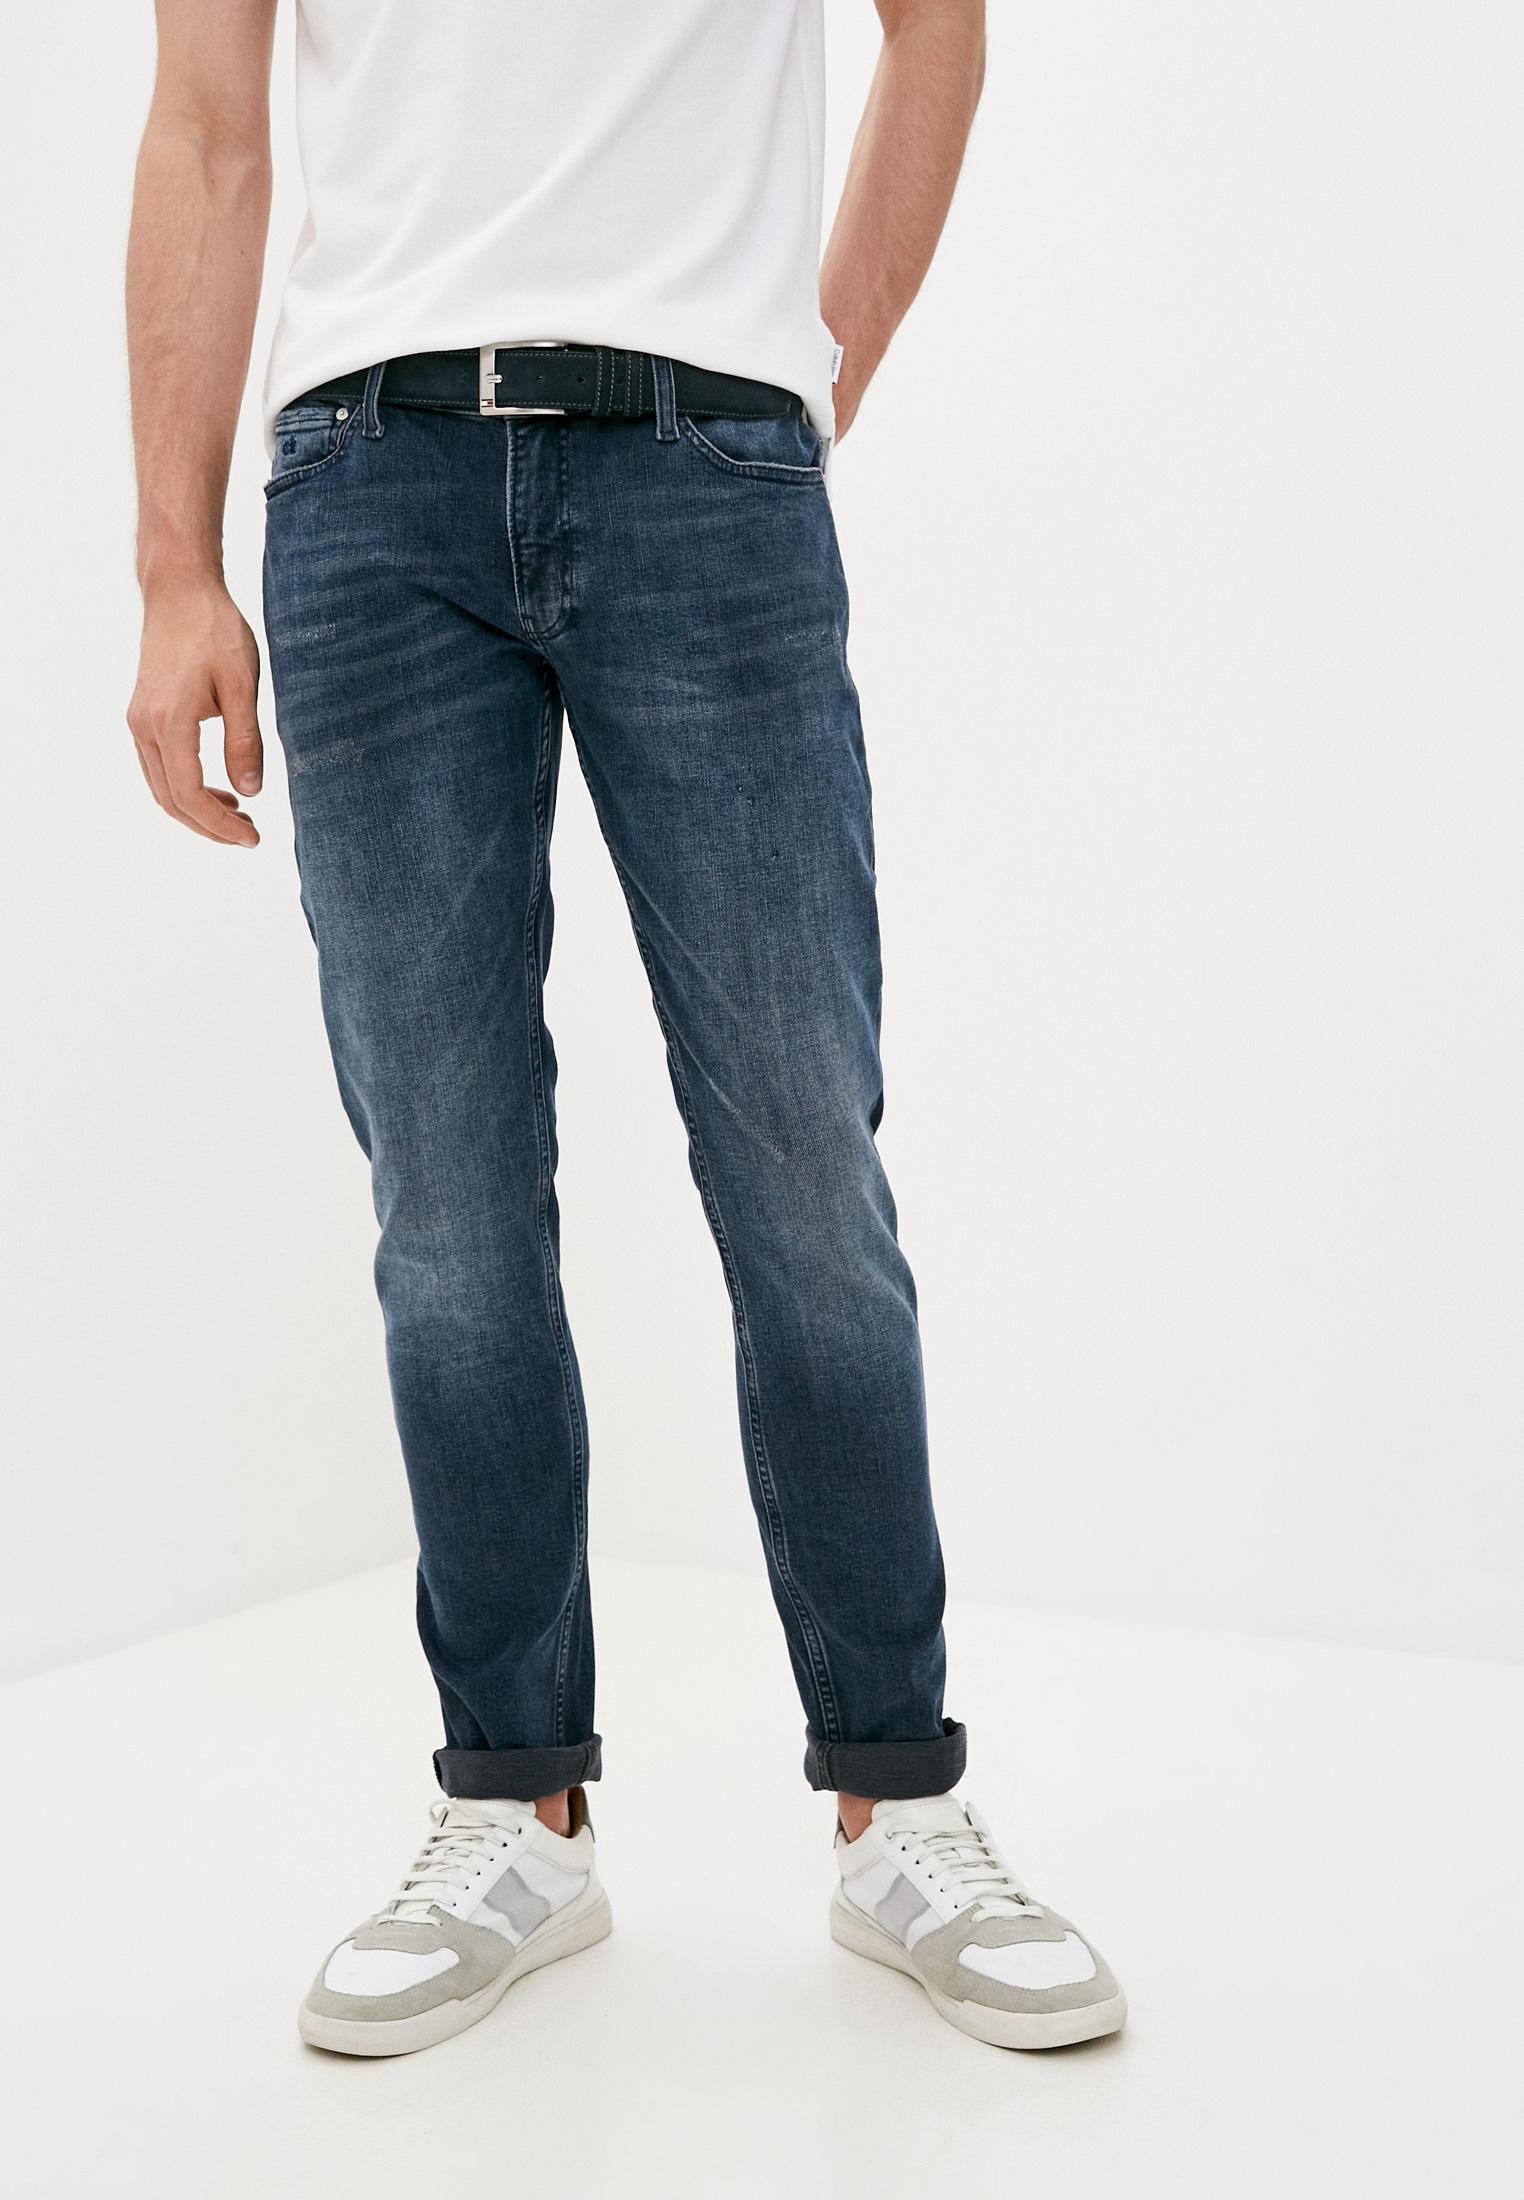 Мужские зауженные джинсы Calvin Klein (Кельвин Кляйн) K10K106561